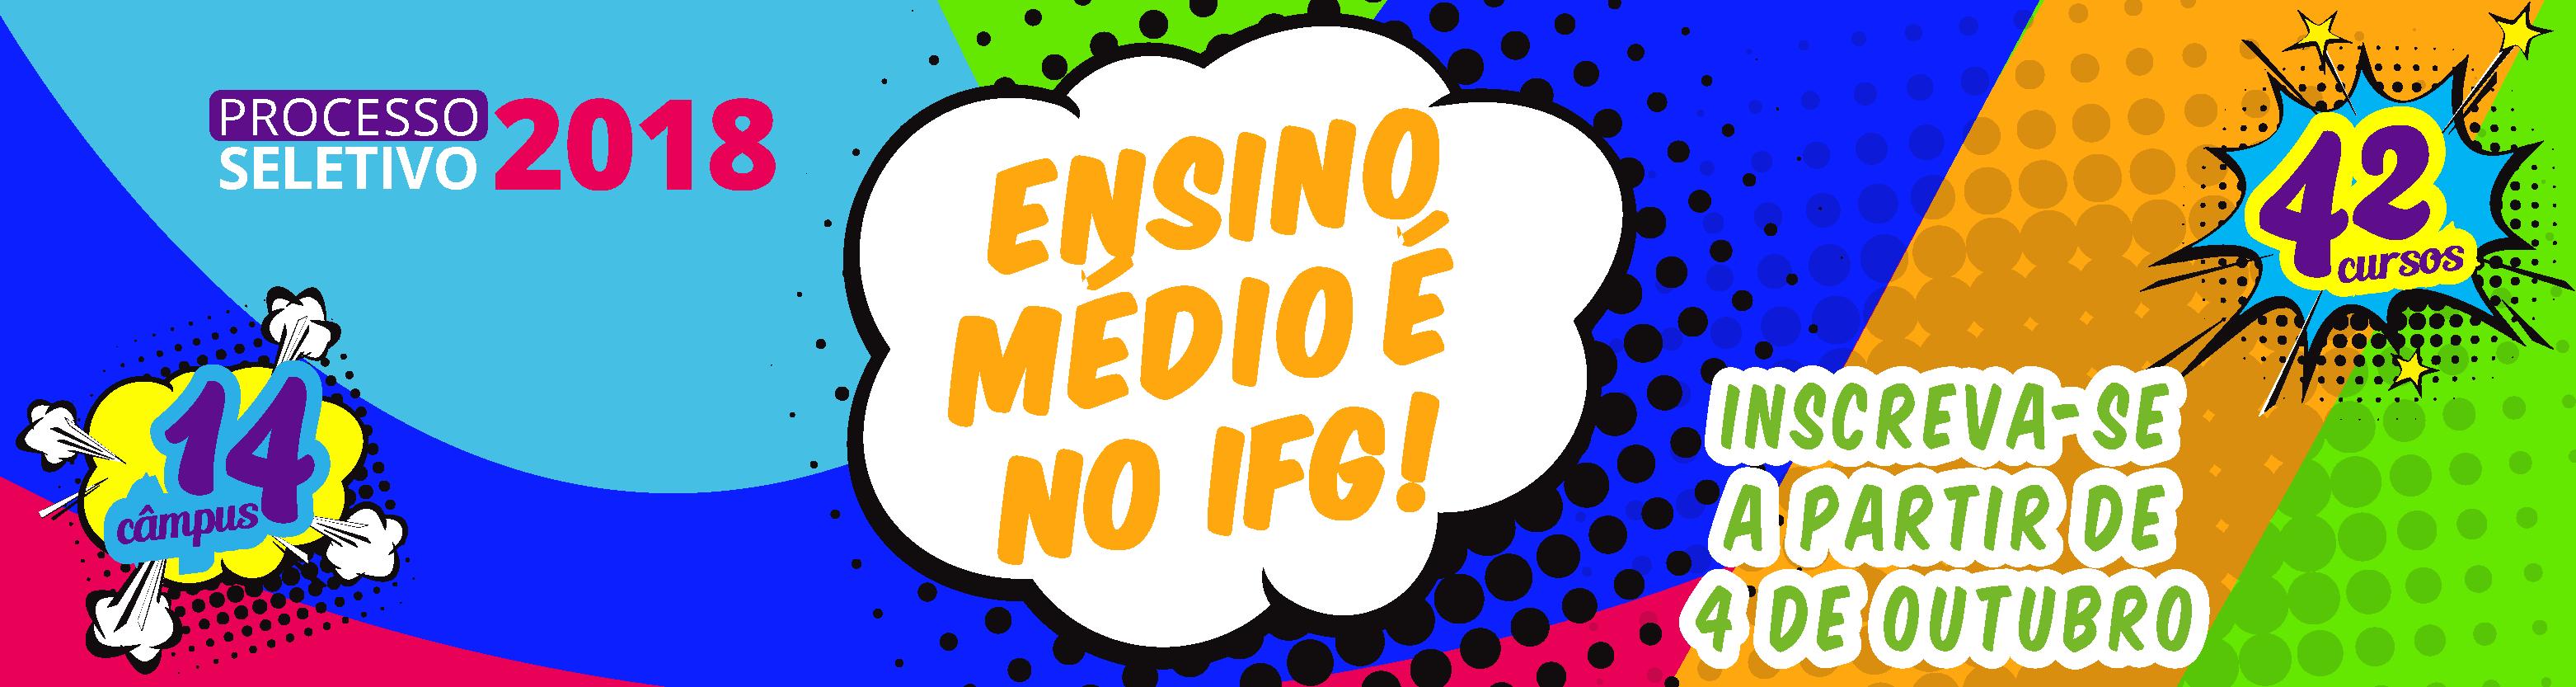 http://www.ifg.edu.br/component/content/article/189-ifg/campus/uruacu/noticias-campus-uruacu/5227-ifg-inicia-hoje-inscricoes-para-selecao-de-cursos-tecnicos-profissionalizantes-de-ensino-medio